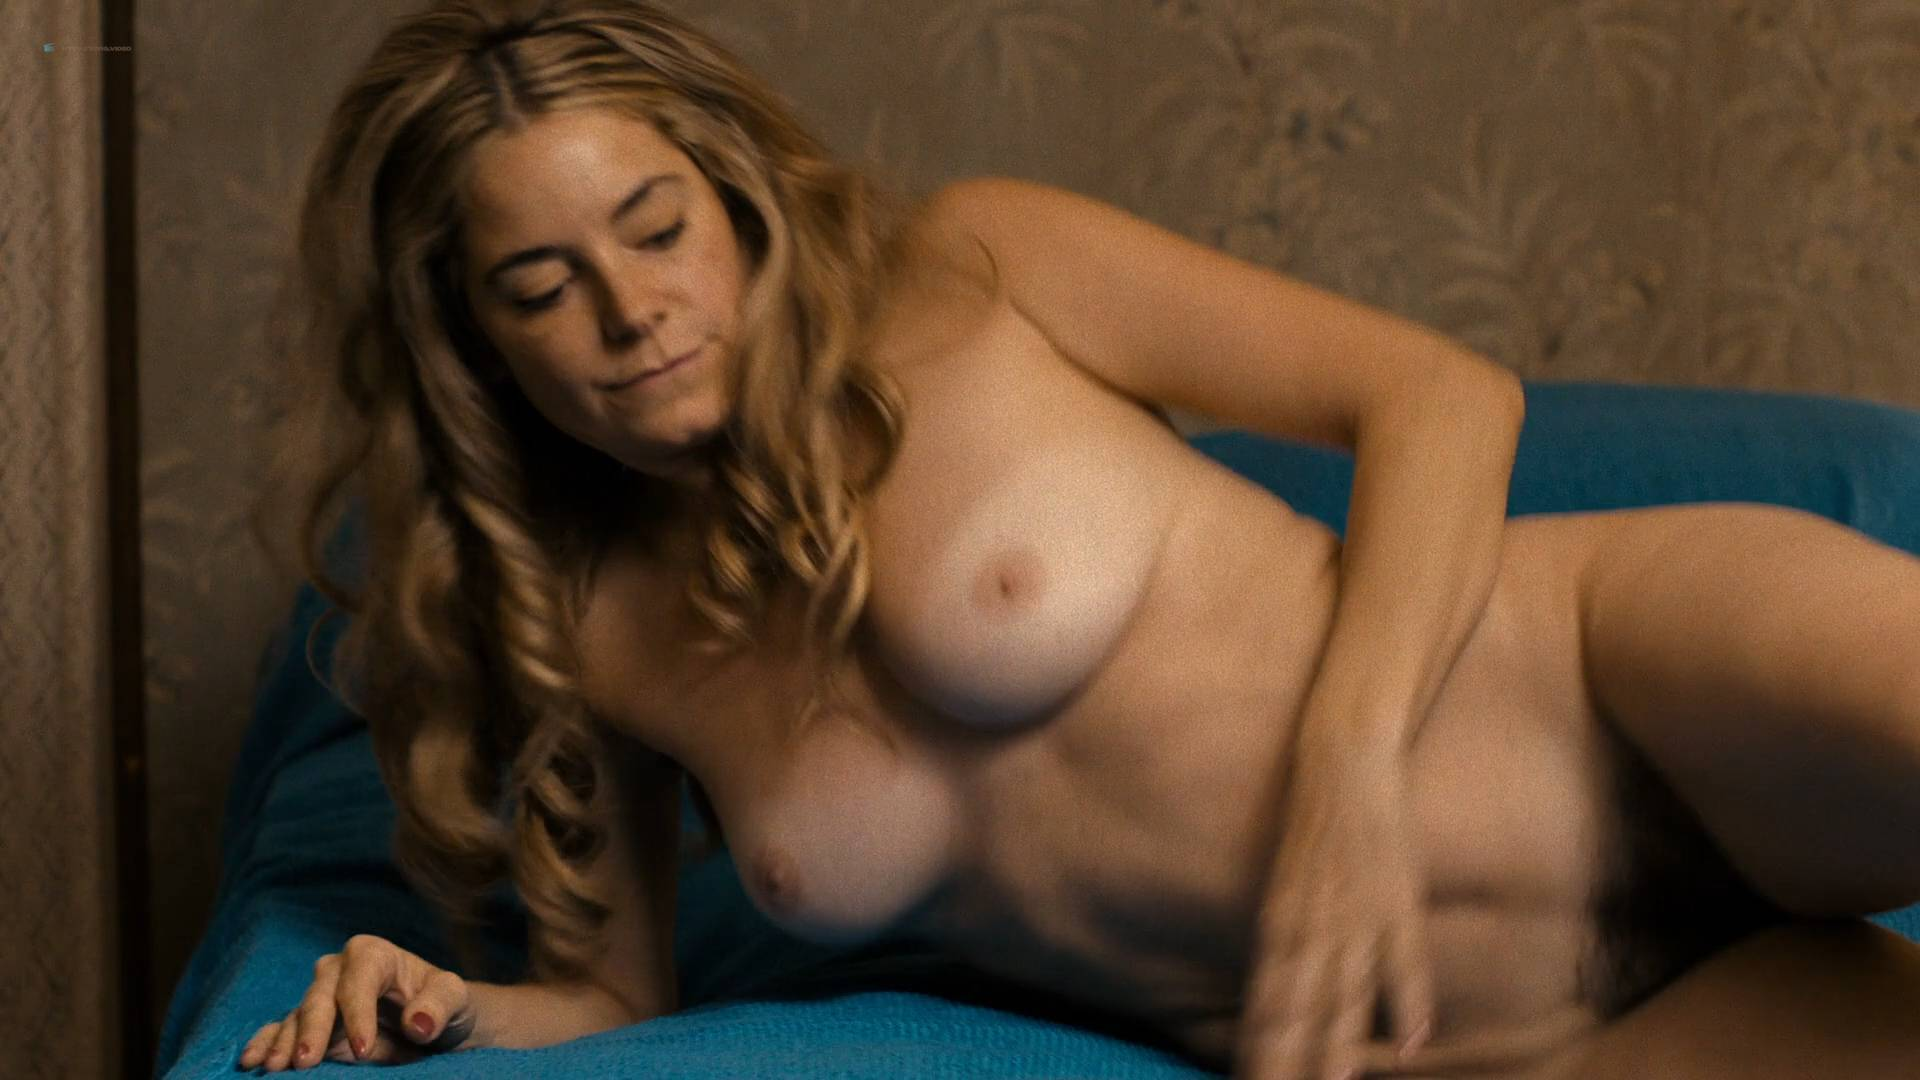 Эмили миде порно фото